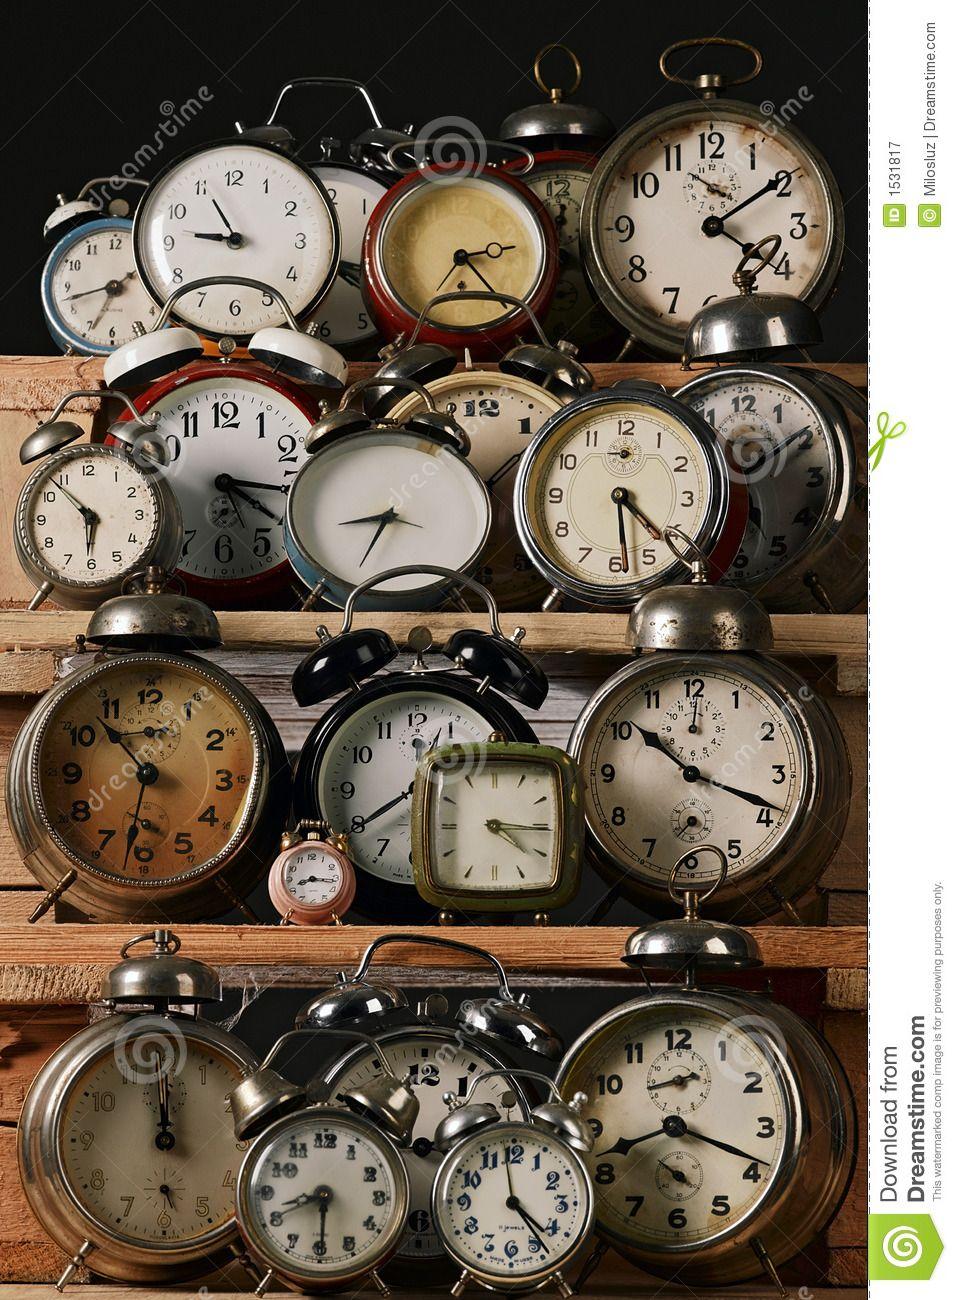 photography clock royalty free